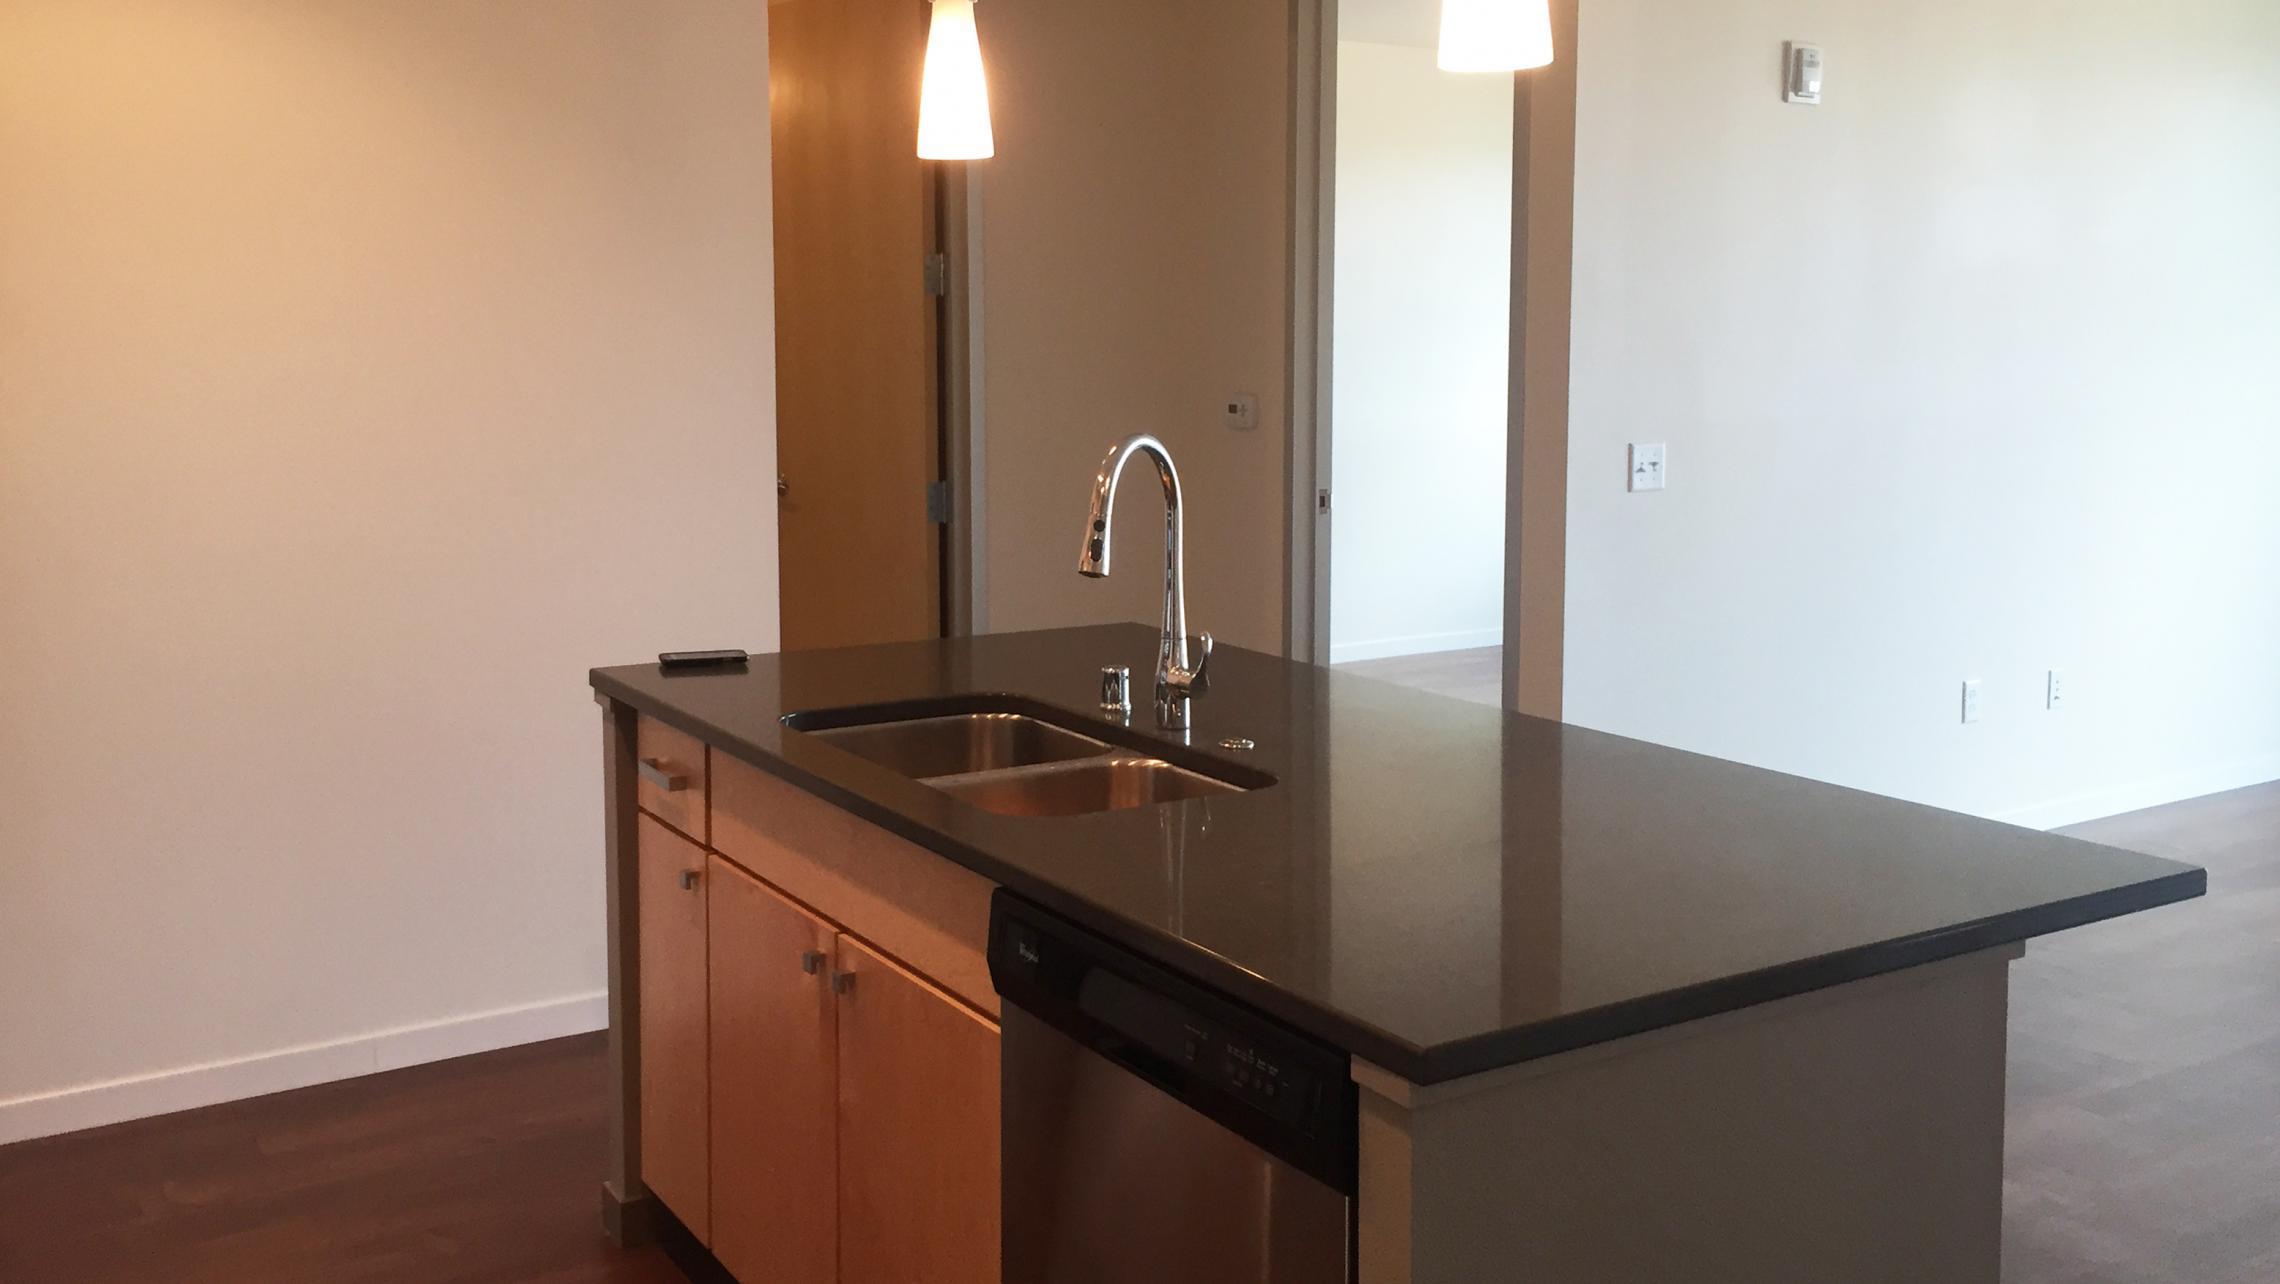 ULI Nine Line Apartment 318 -  Kitchen Island